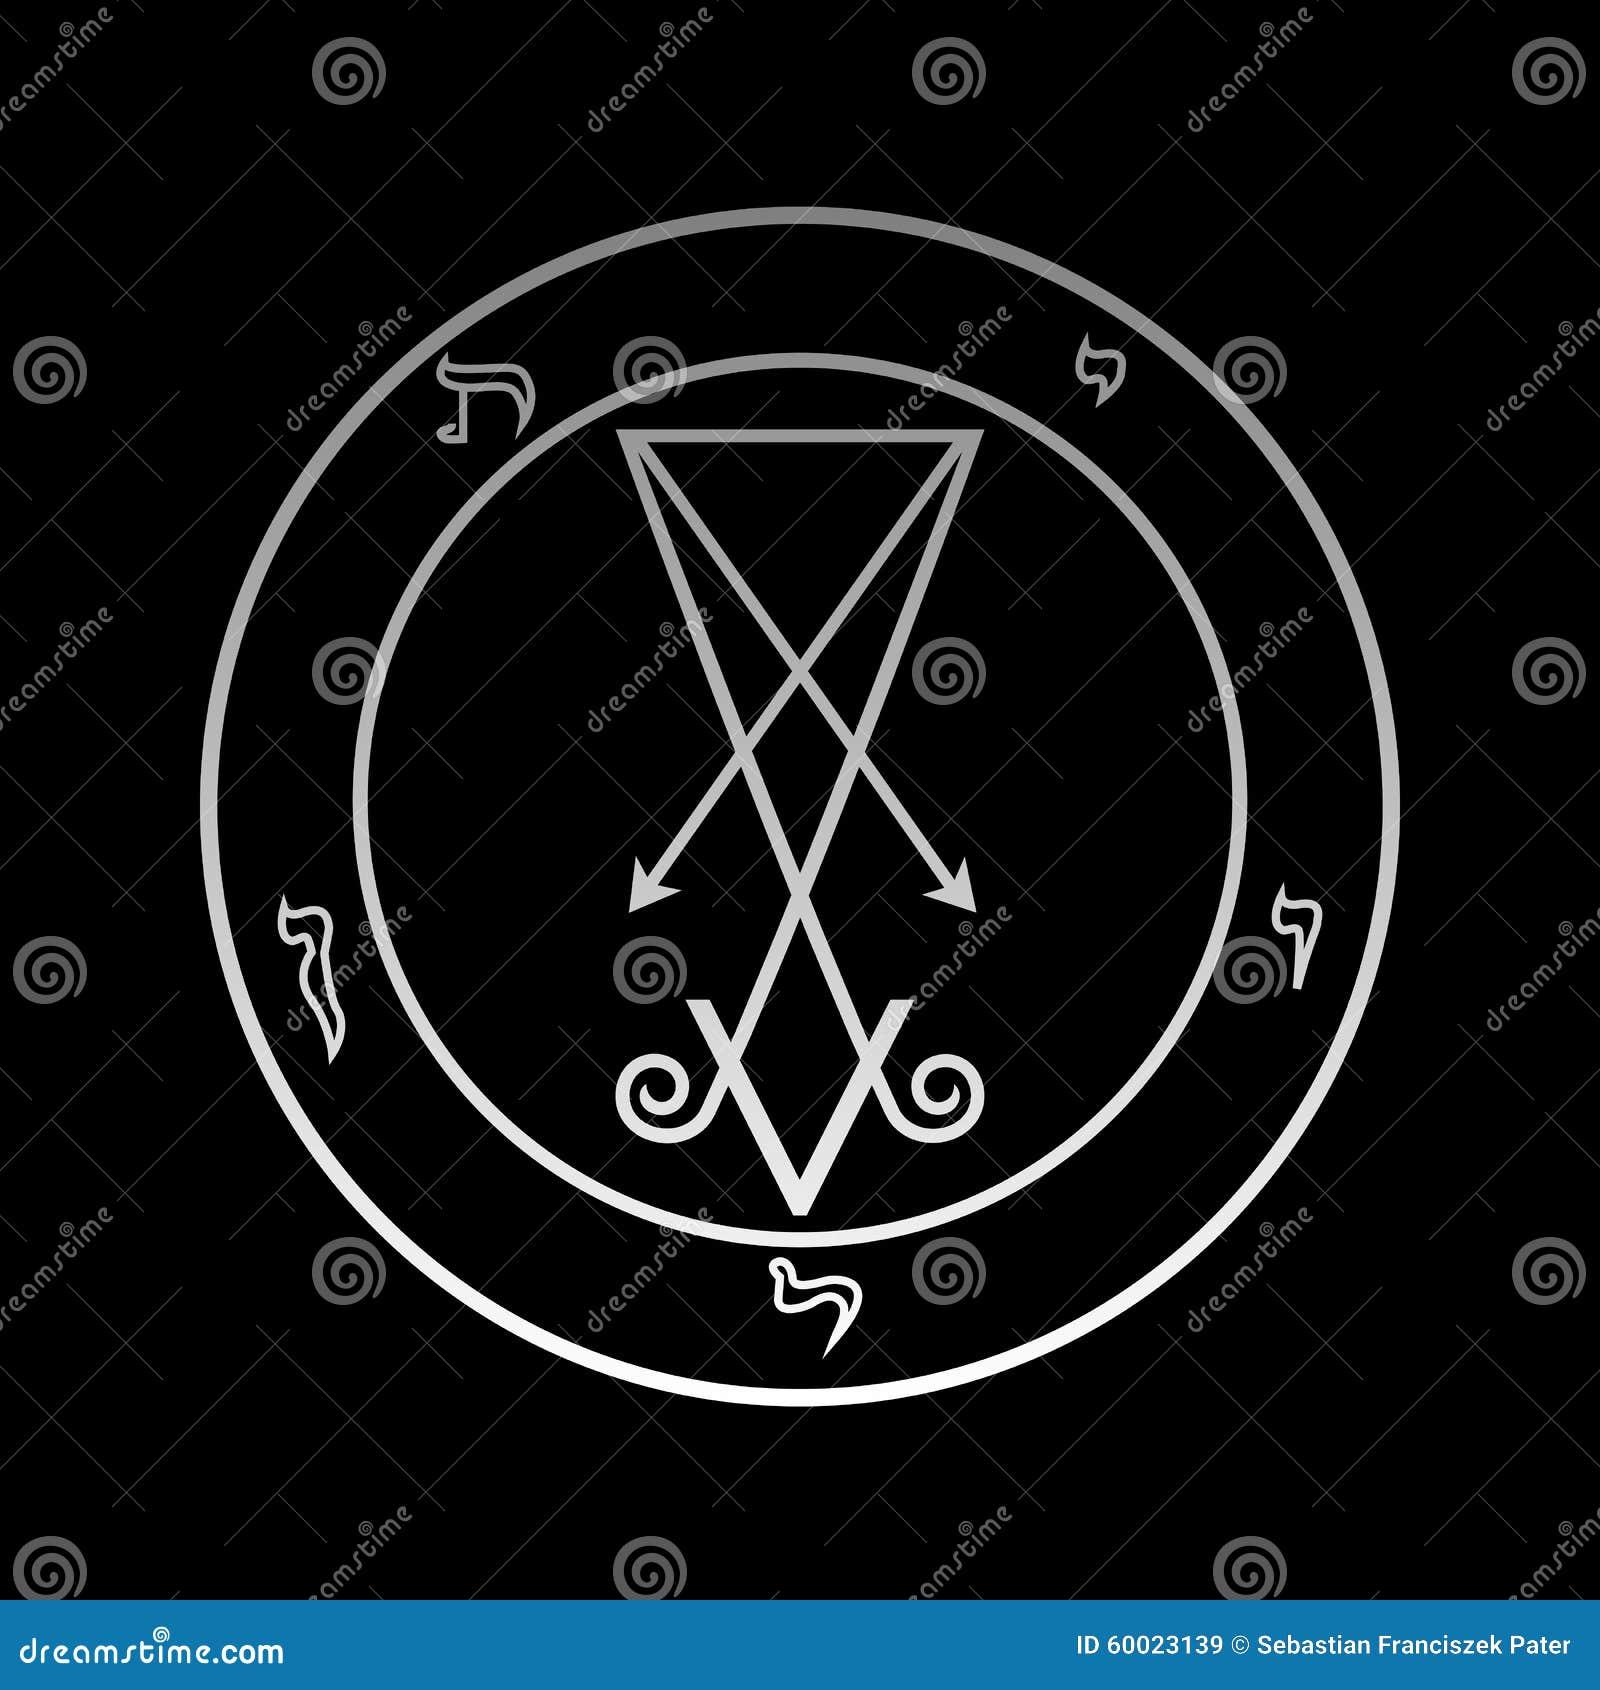 simbol oficial